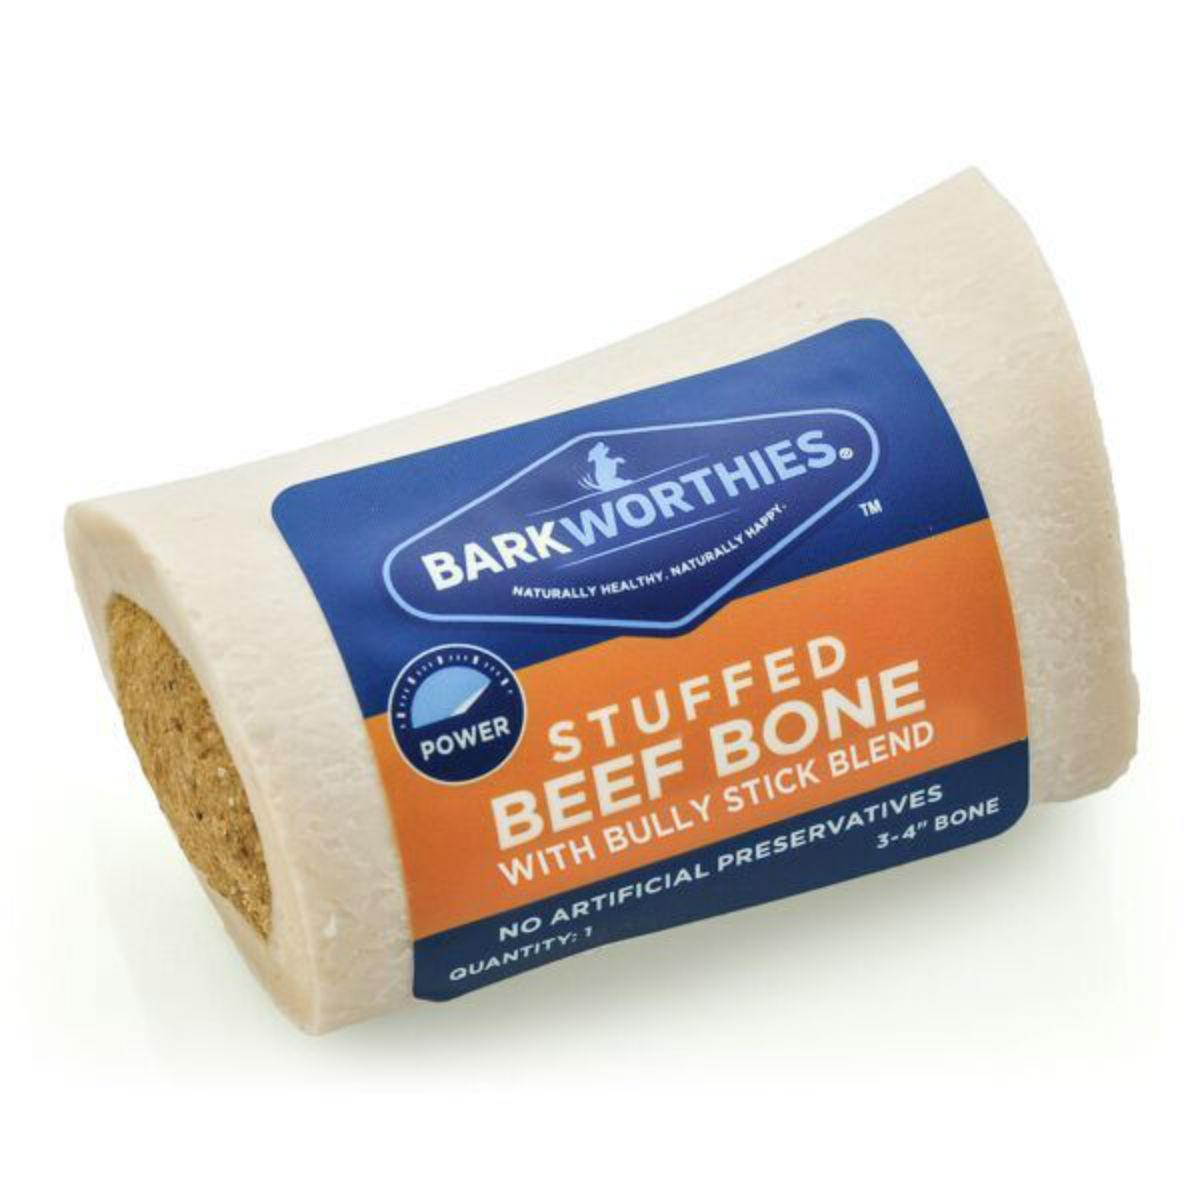 Barkworthies Stuffed Beef Shin Bone Dog Treat - Bully Stick Blend